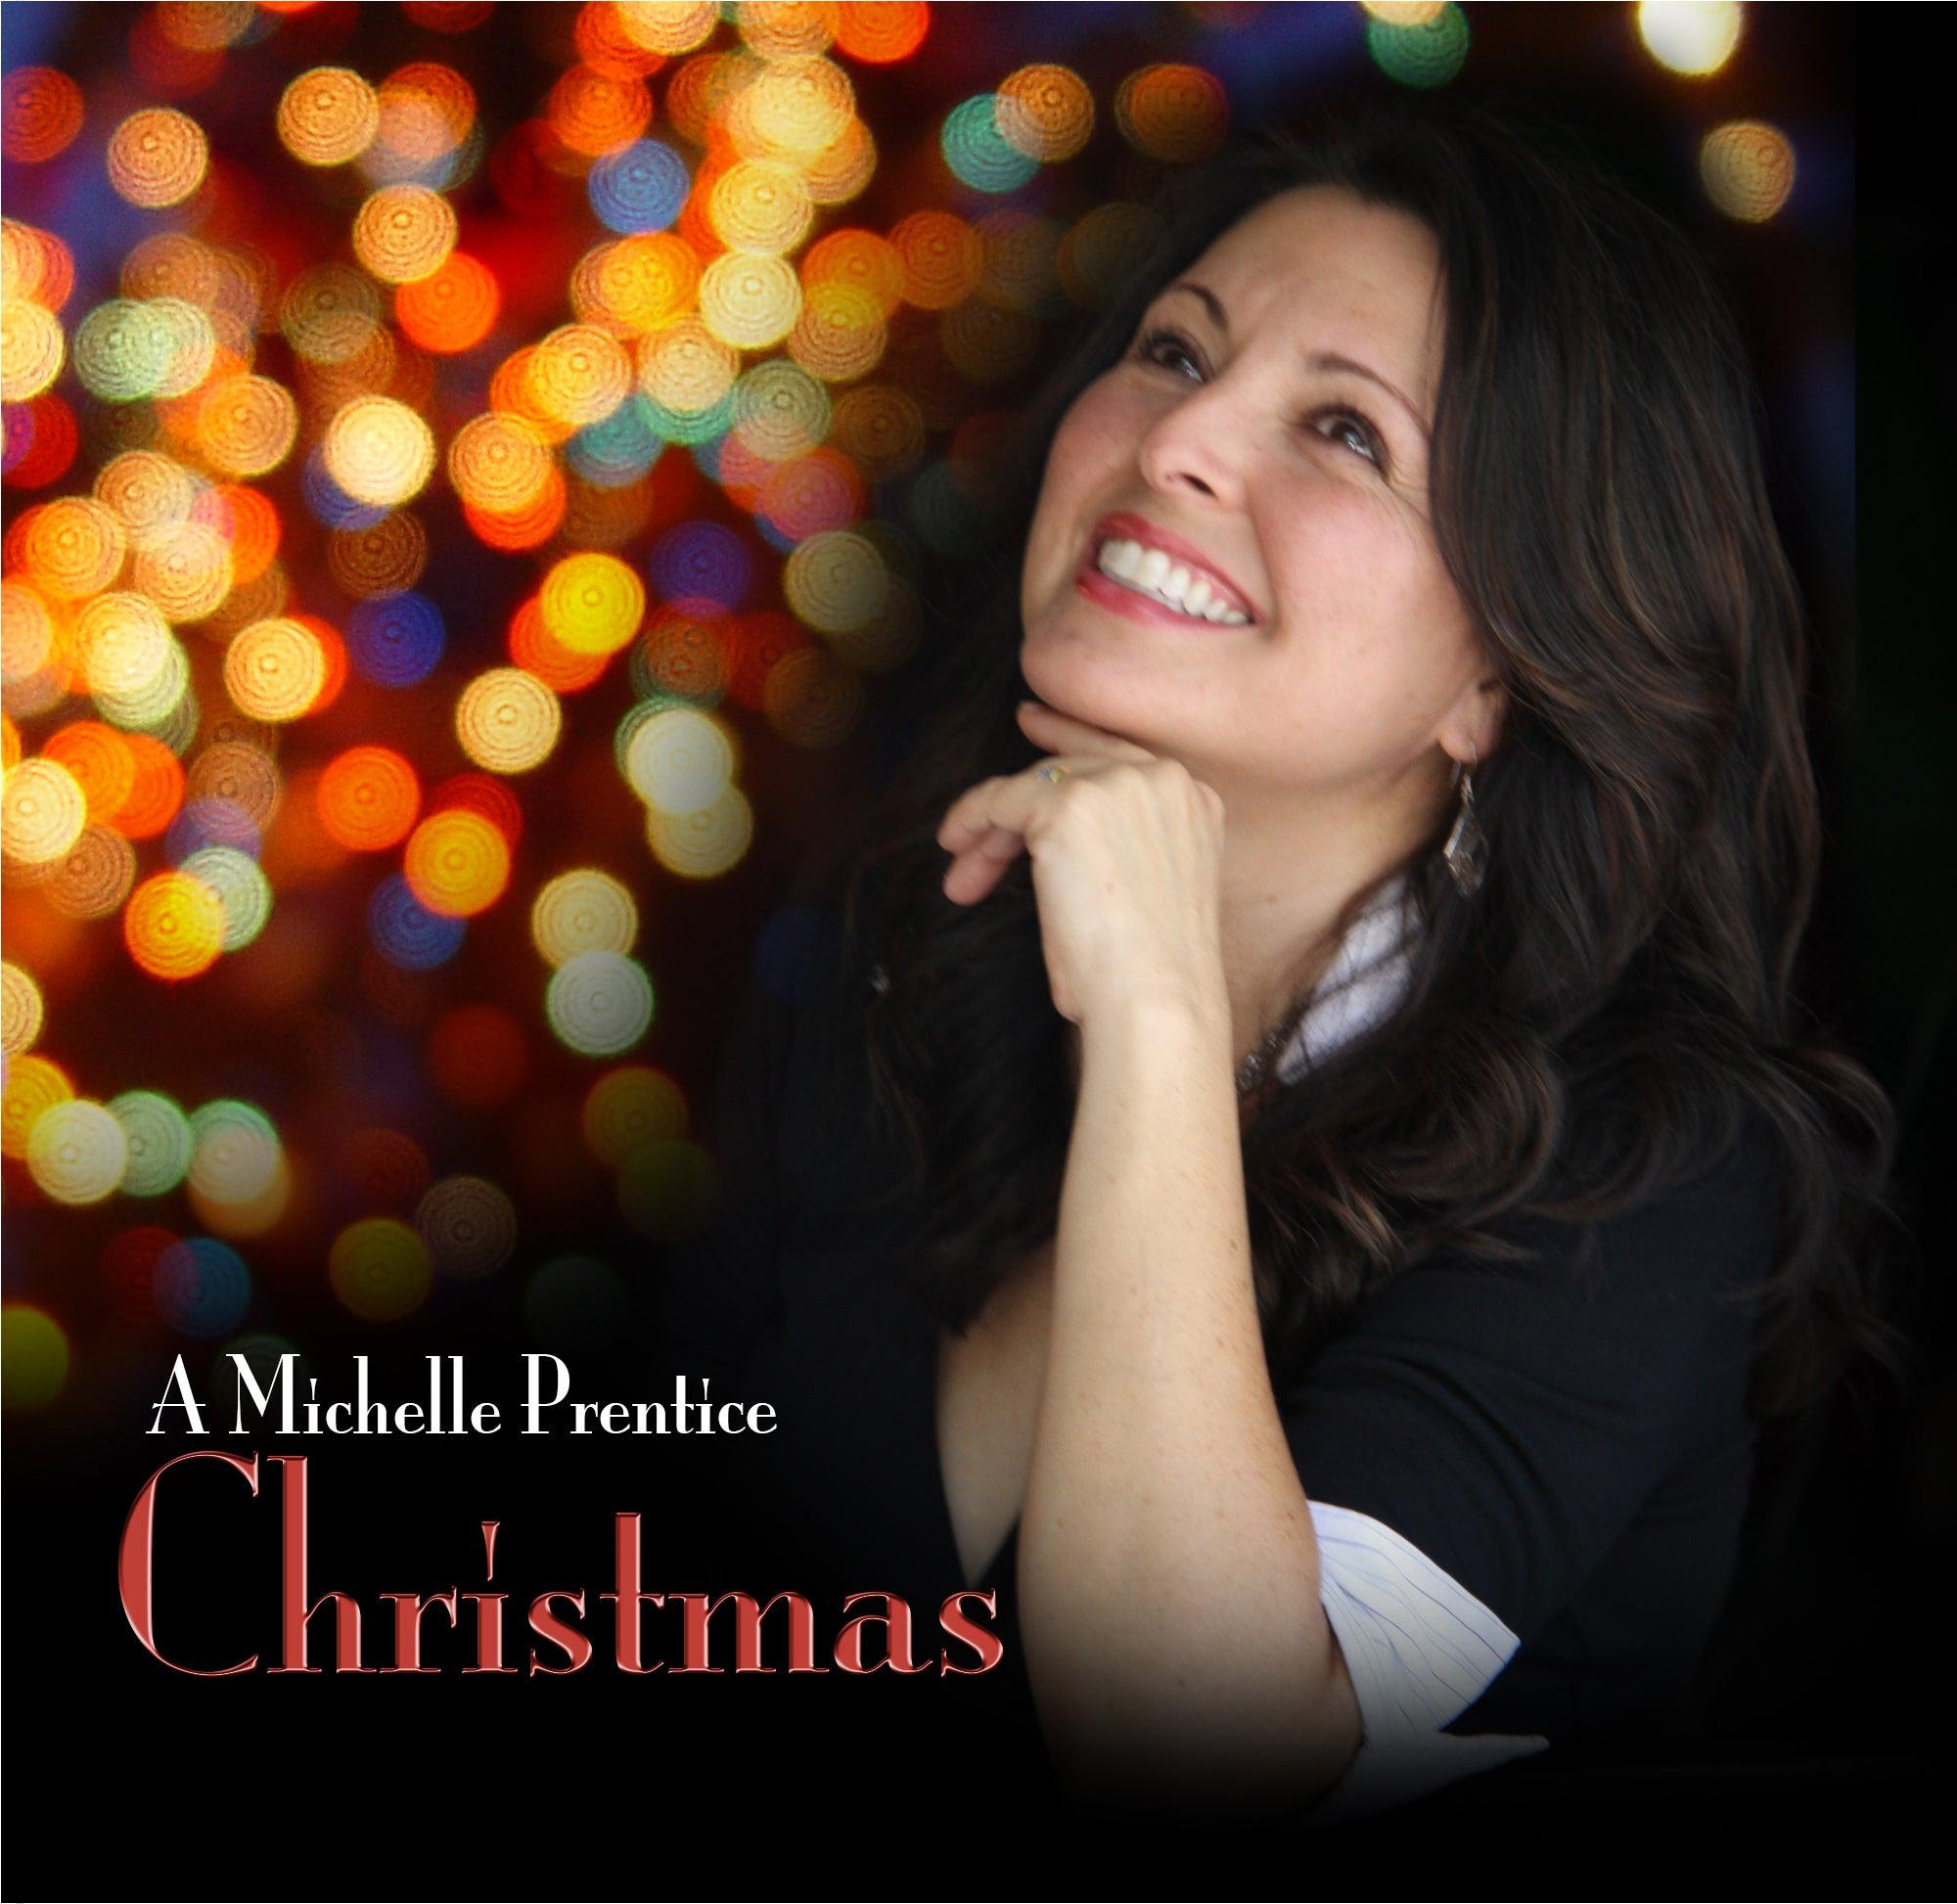 """O Holy Night"" by Michelle Prentice (Album: A Michelle Prentice Christmas)"